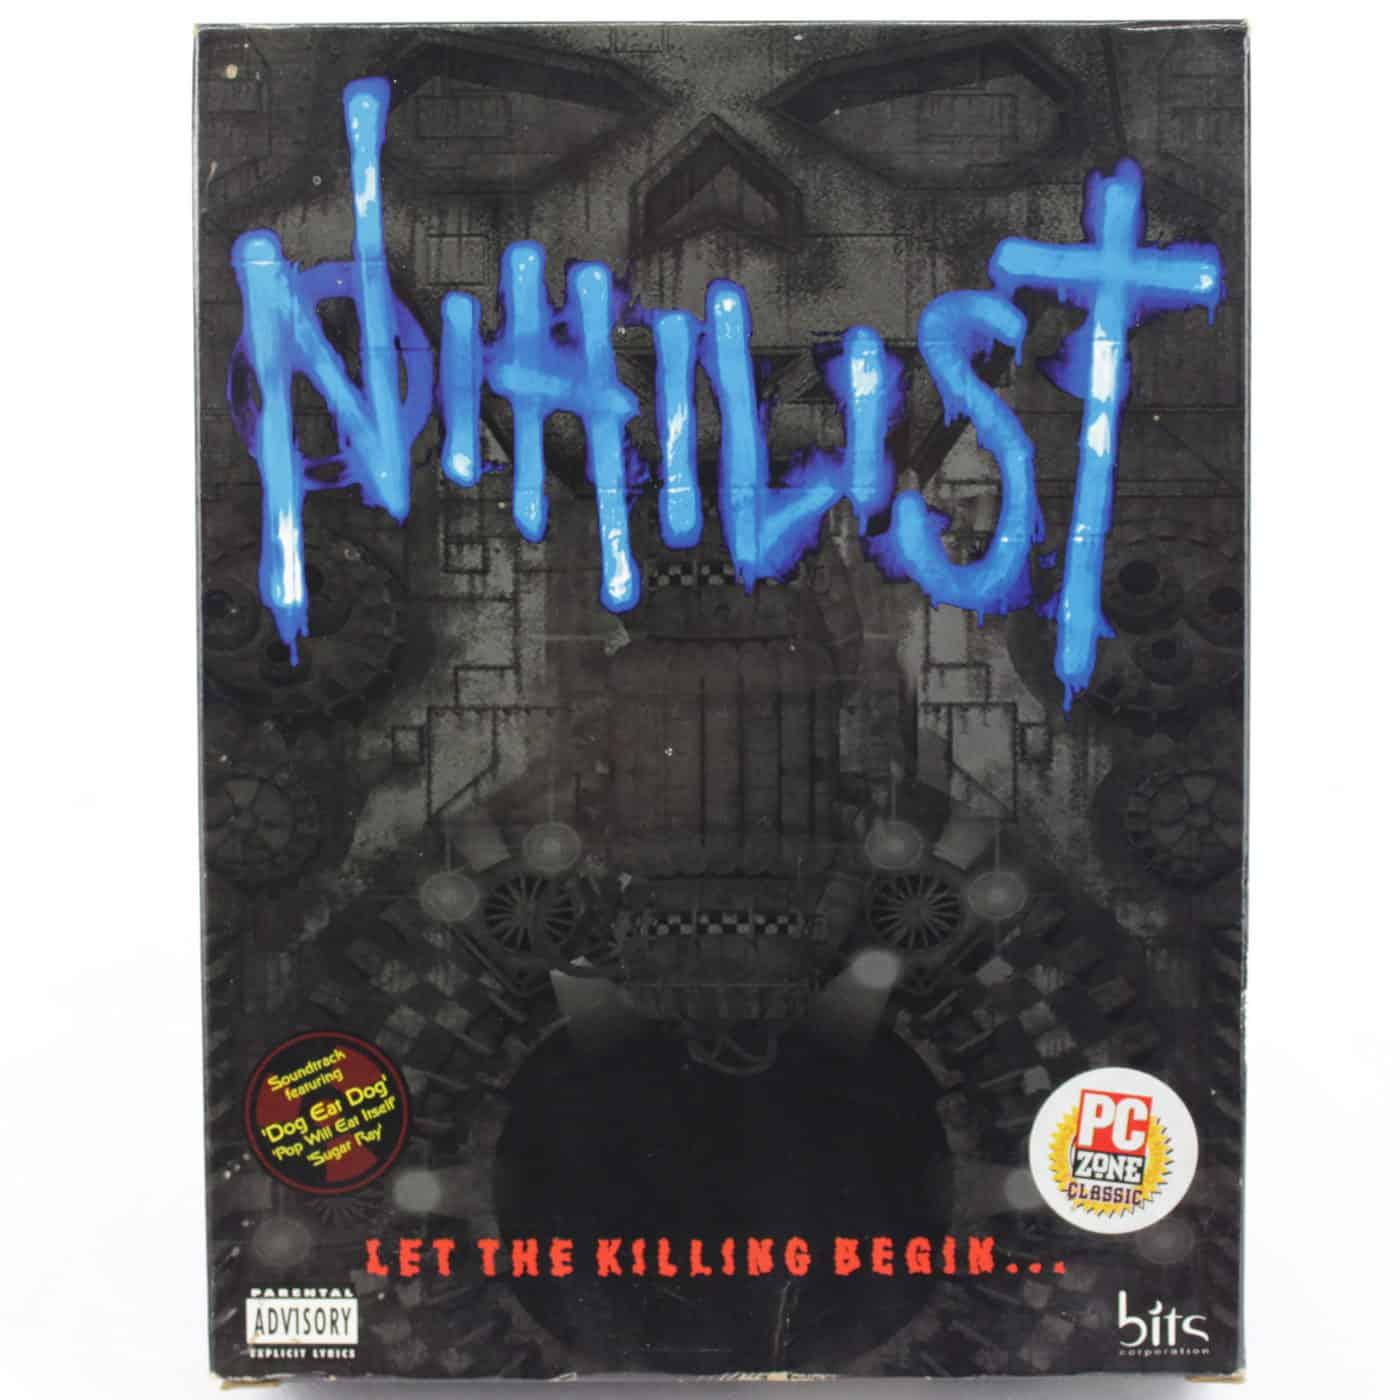 Nihilist (PC Big Box, 1996, DOS, Bits Corporation / Philips Interactive)